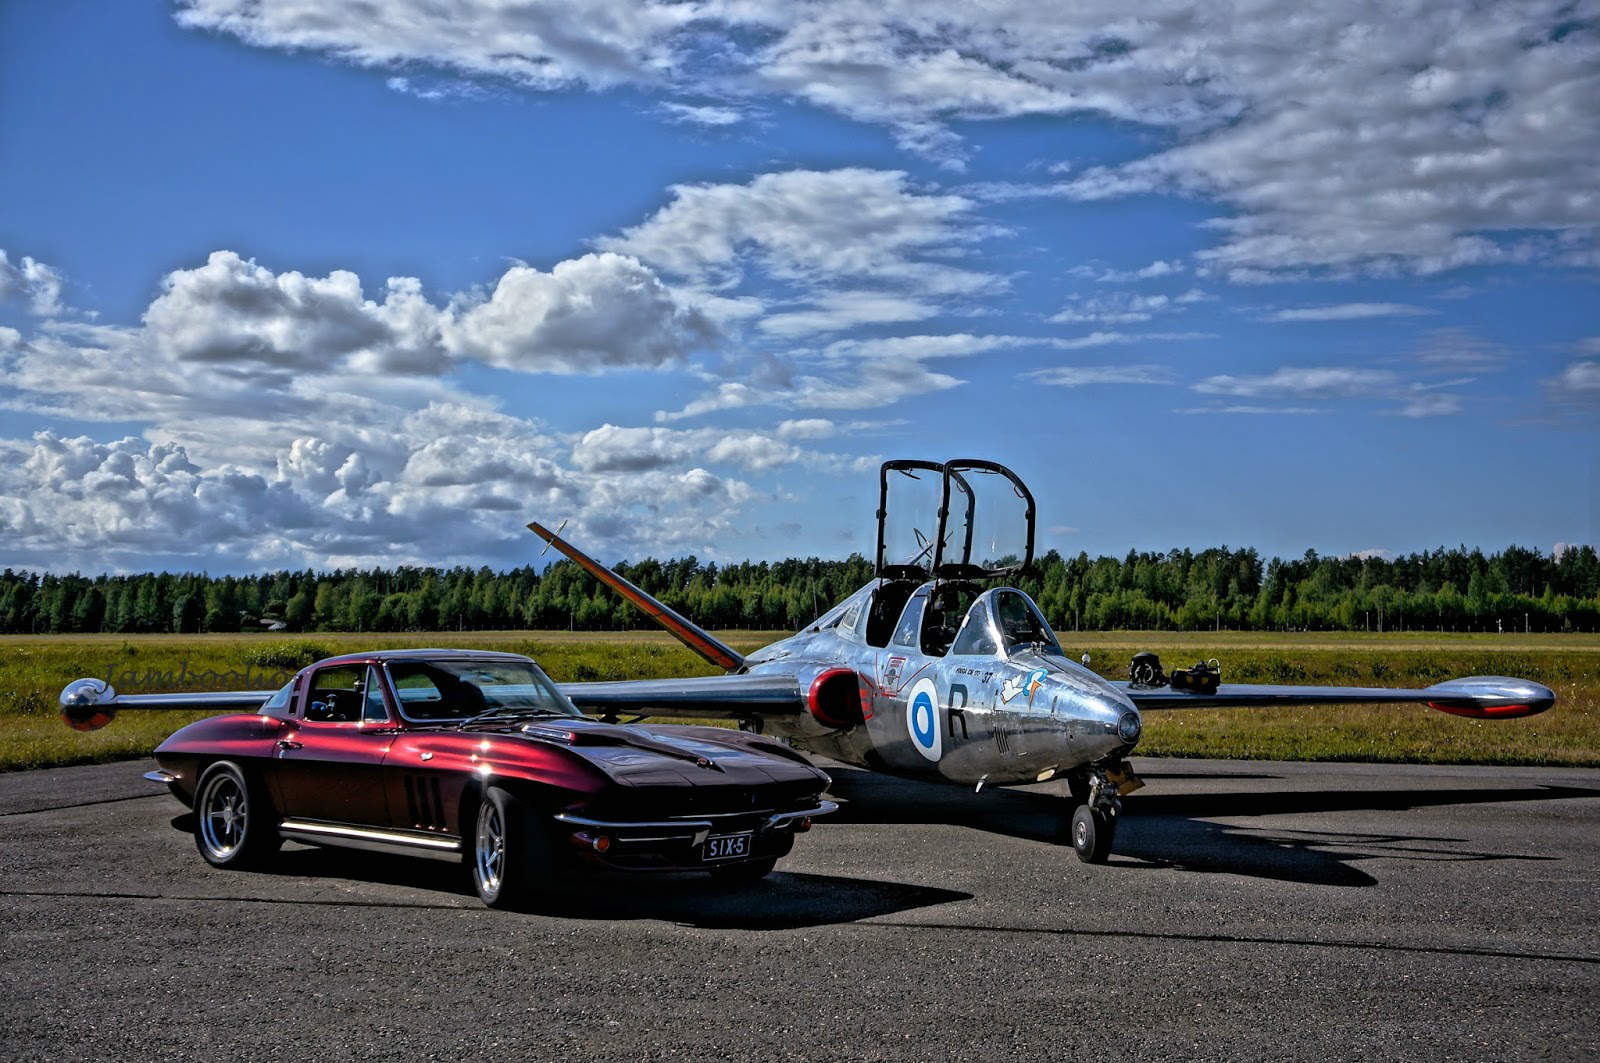 1965 Chevrolet Corvette C2 Stingray SIX-5 next to aeroplane